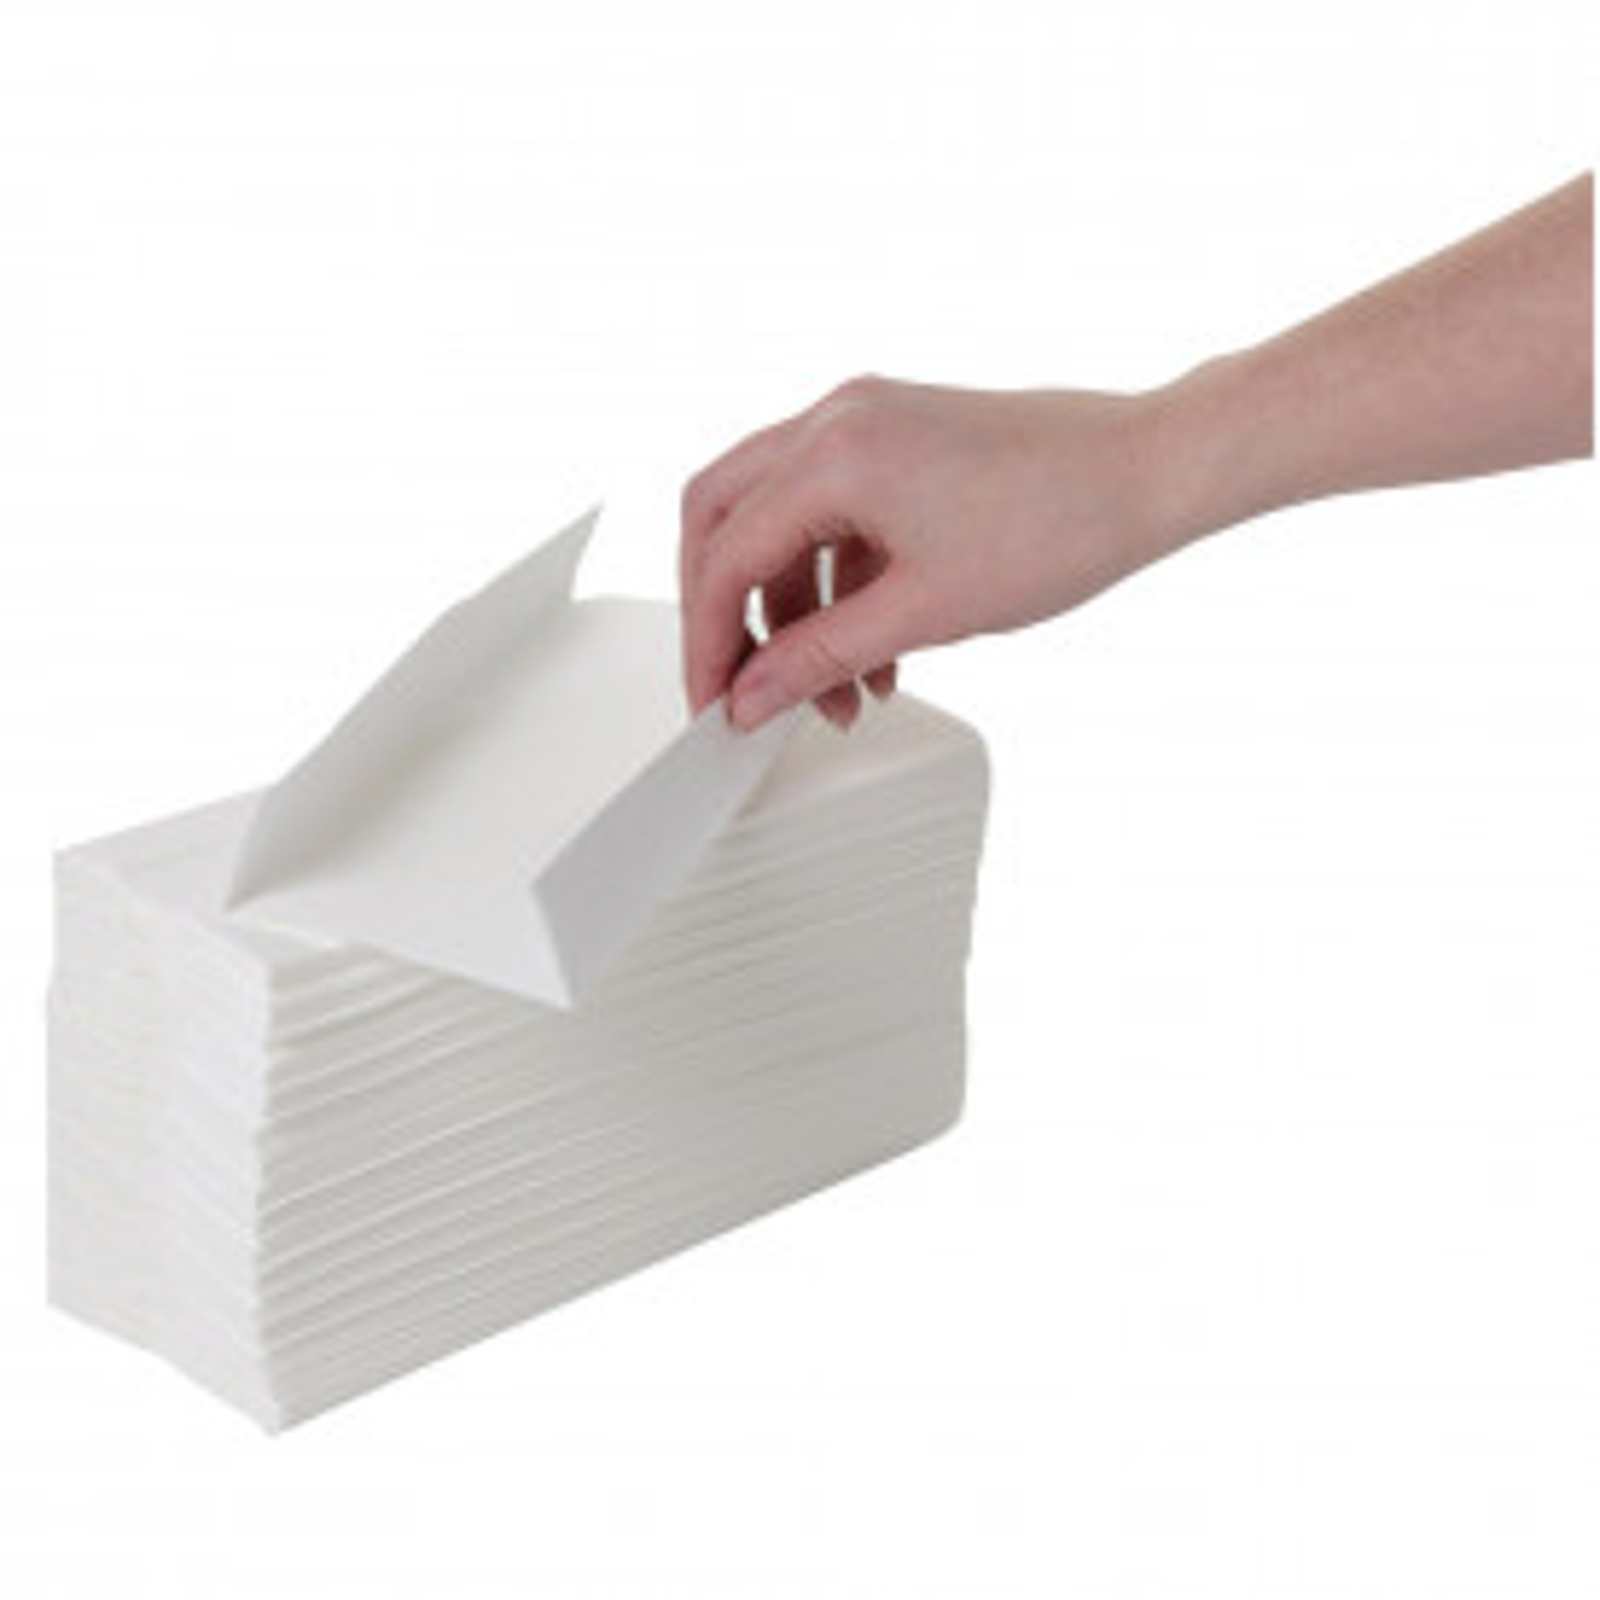 Consortium C-Fold Flushable Hand Towels 2 Ply